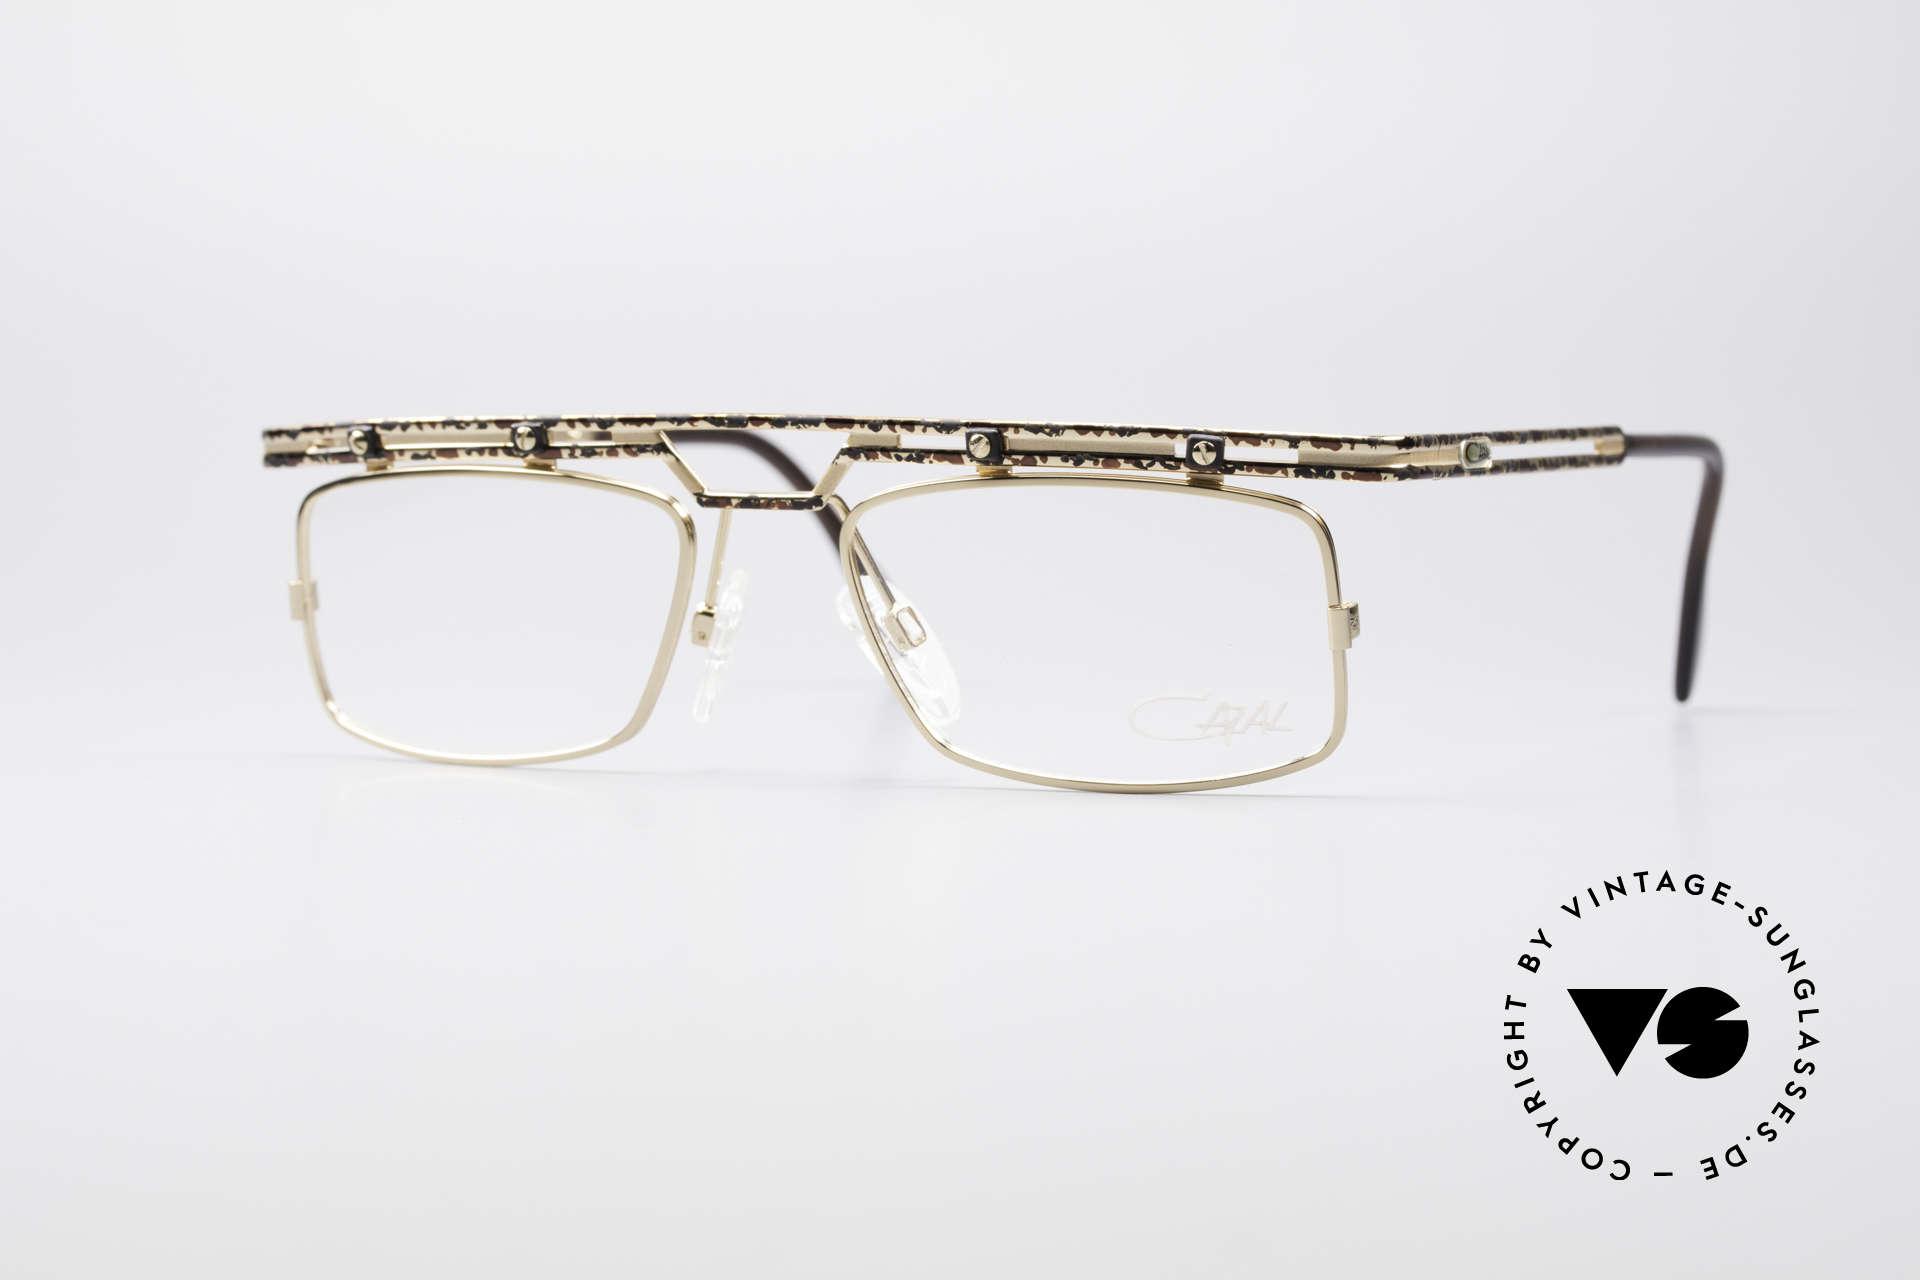 Cazal 975 True Vintage No Retro Glasses, striking / square Cazal vintage glasses from 1996/97, Made for Men